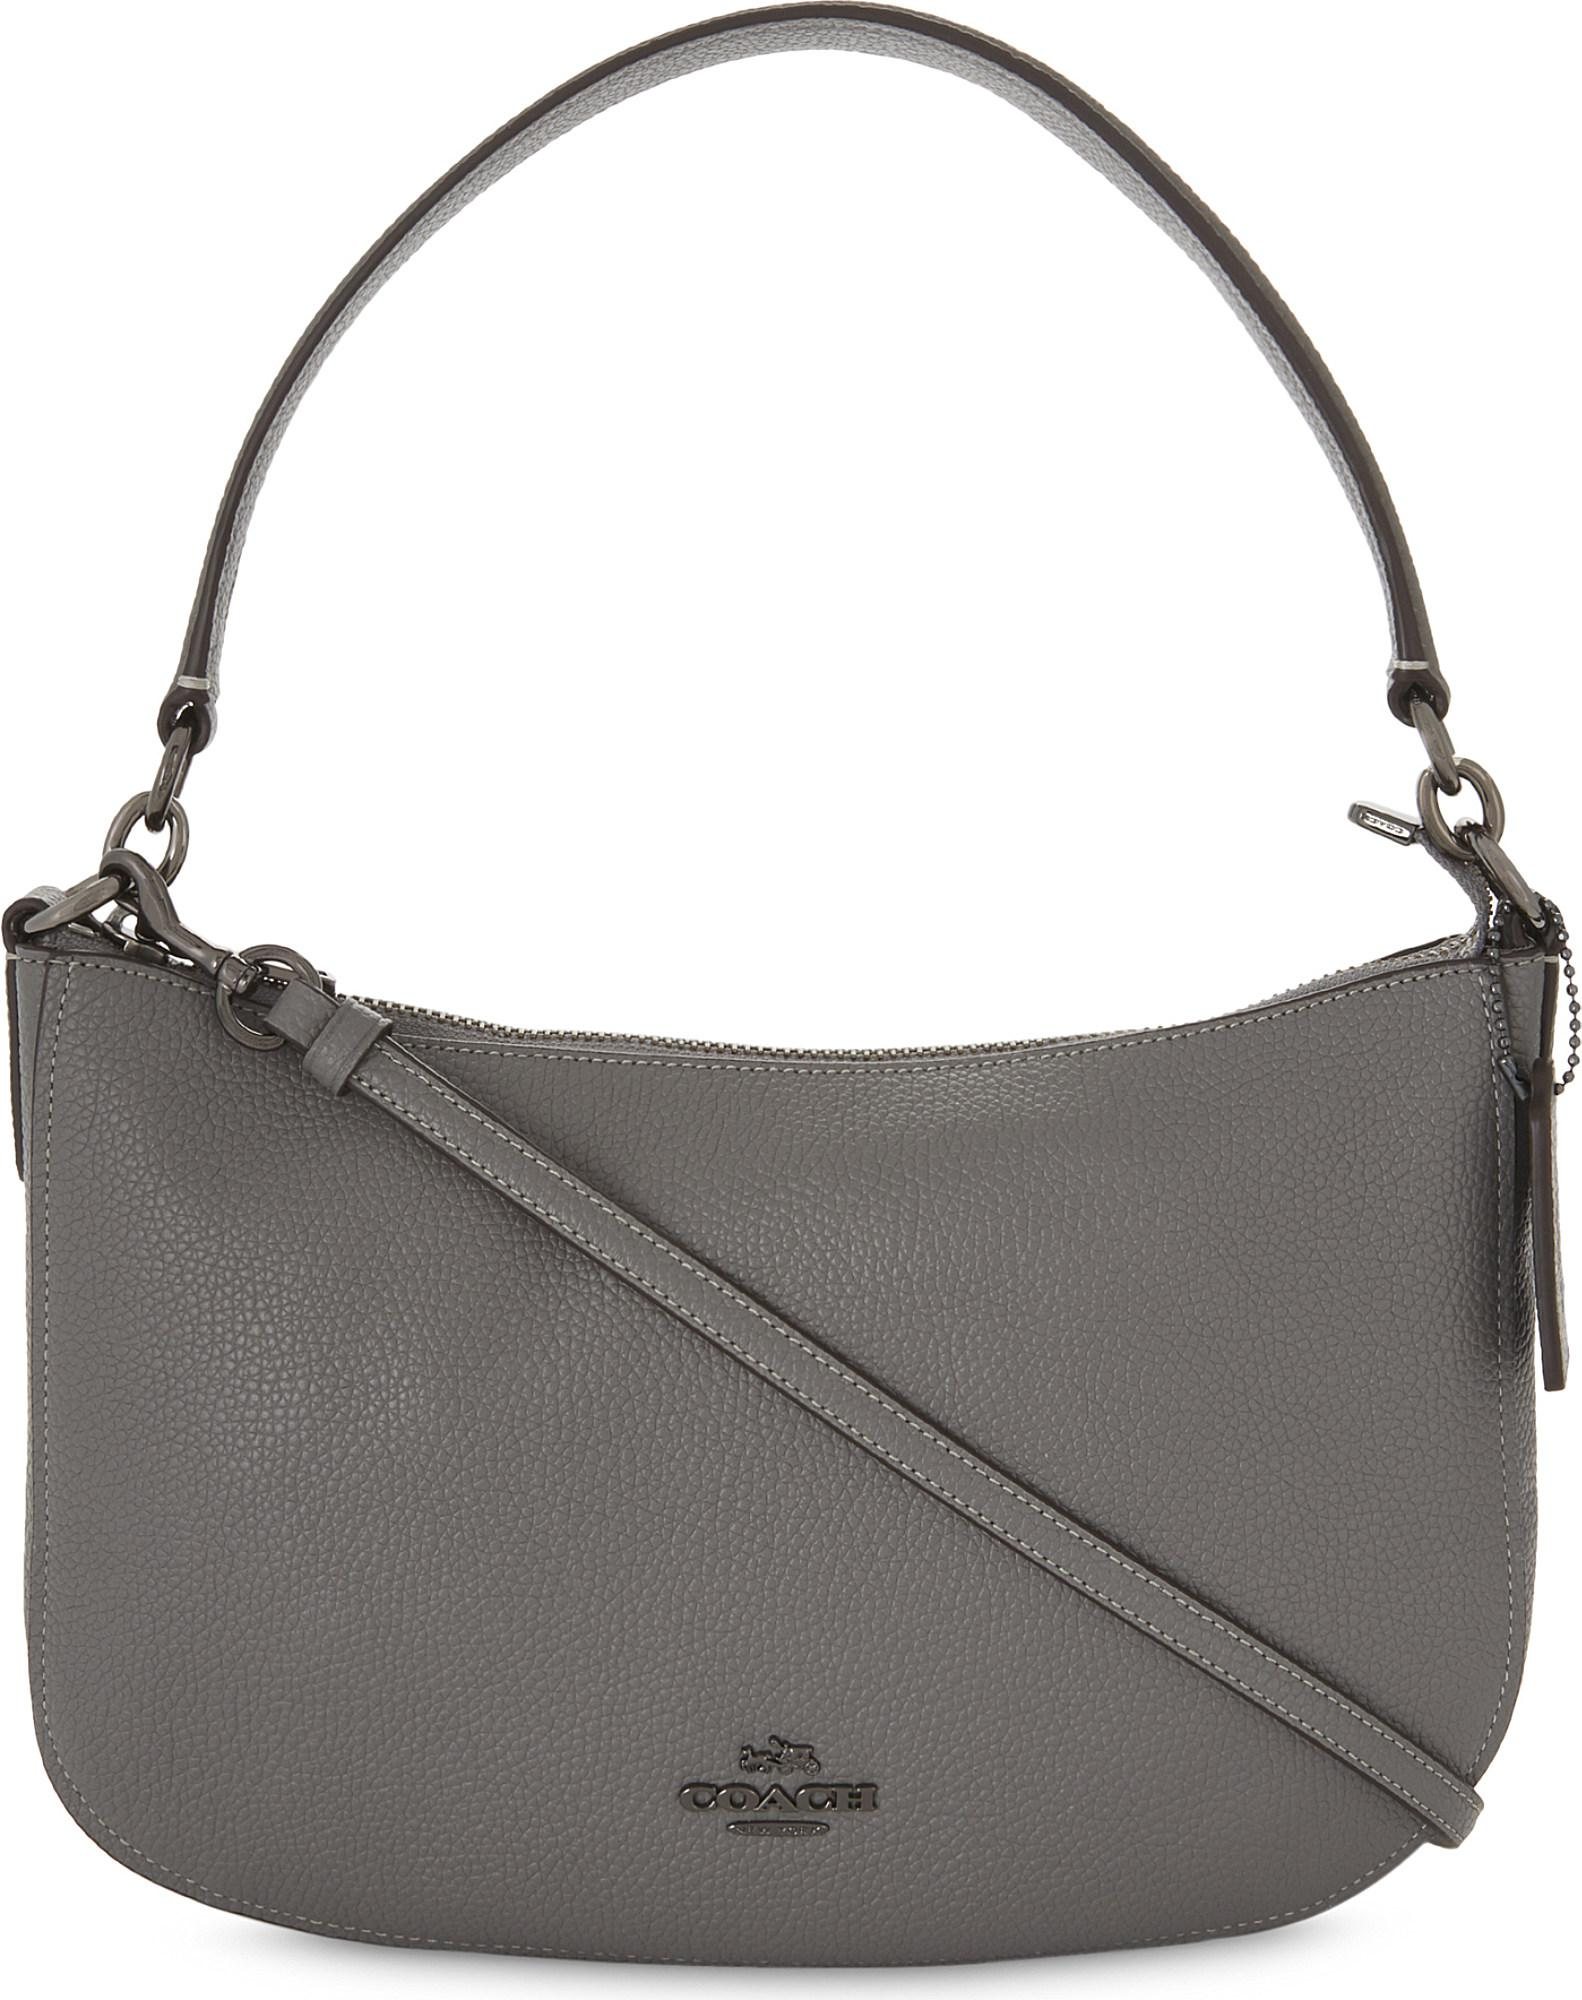 9658efc6d9 ... order coach chelsea flap hobo black leather shoulder bag tradesy coach  chelsea leather cross body bag